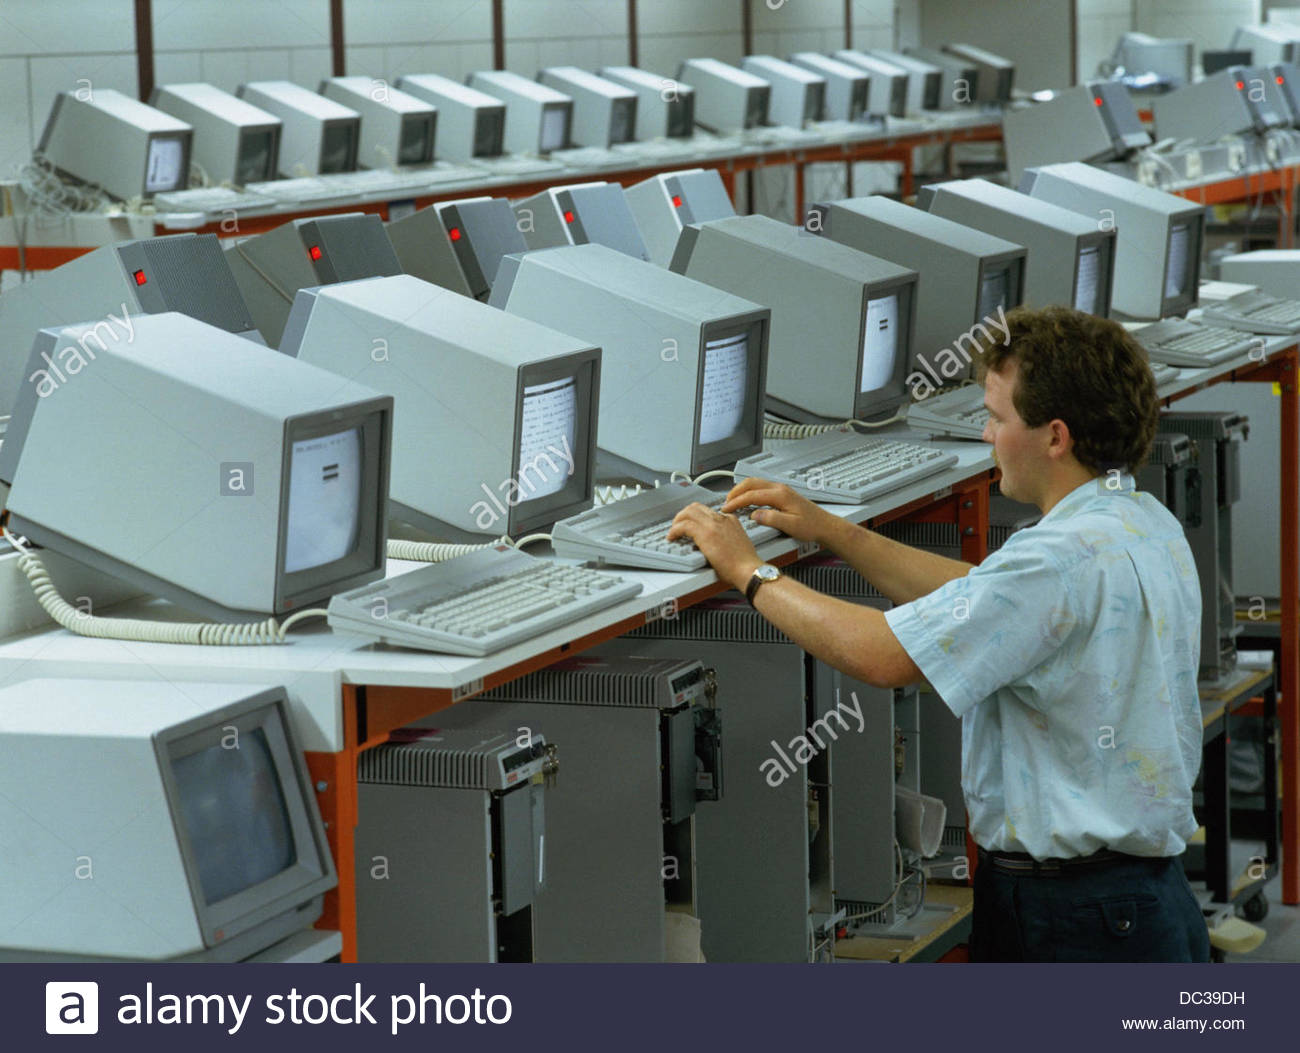 90s computer stock photos